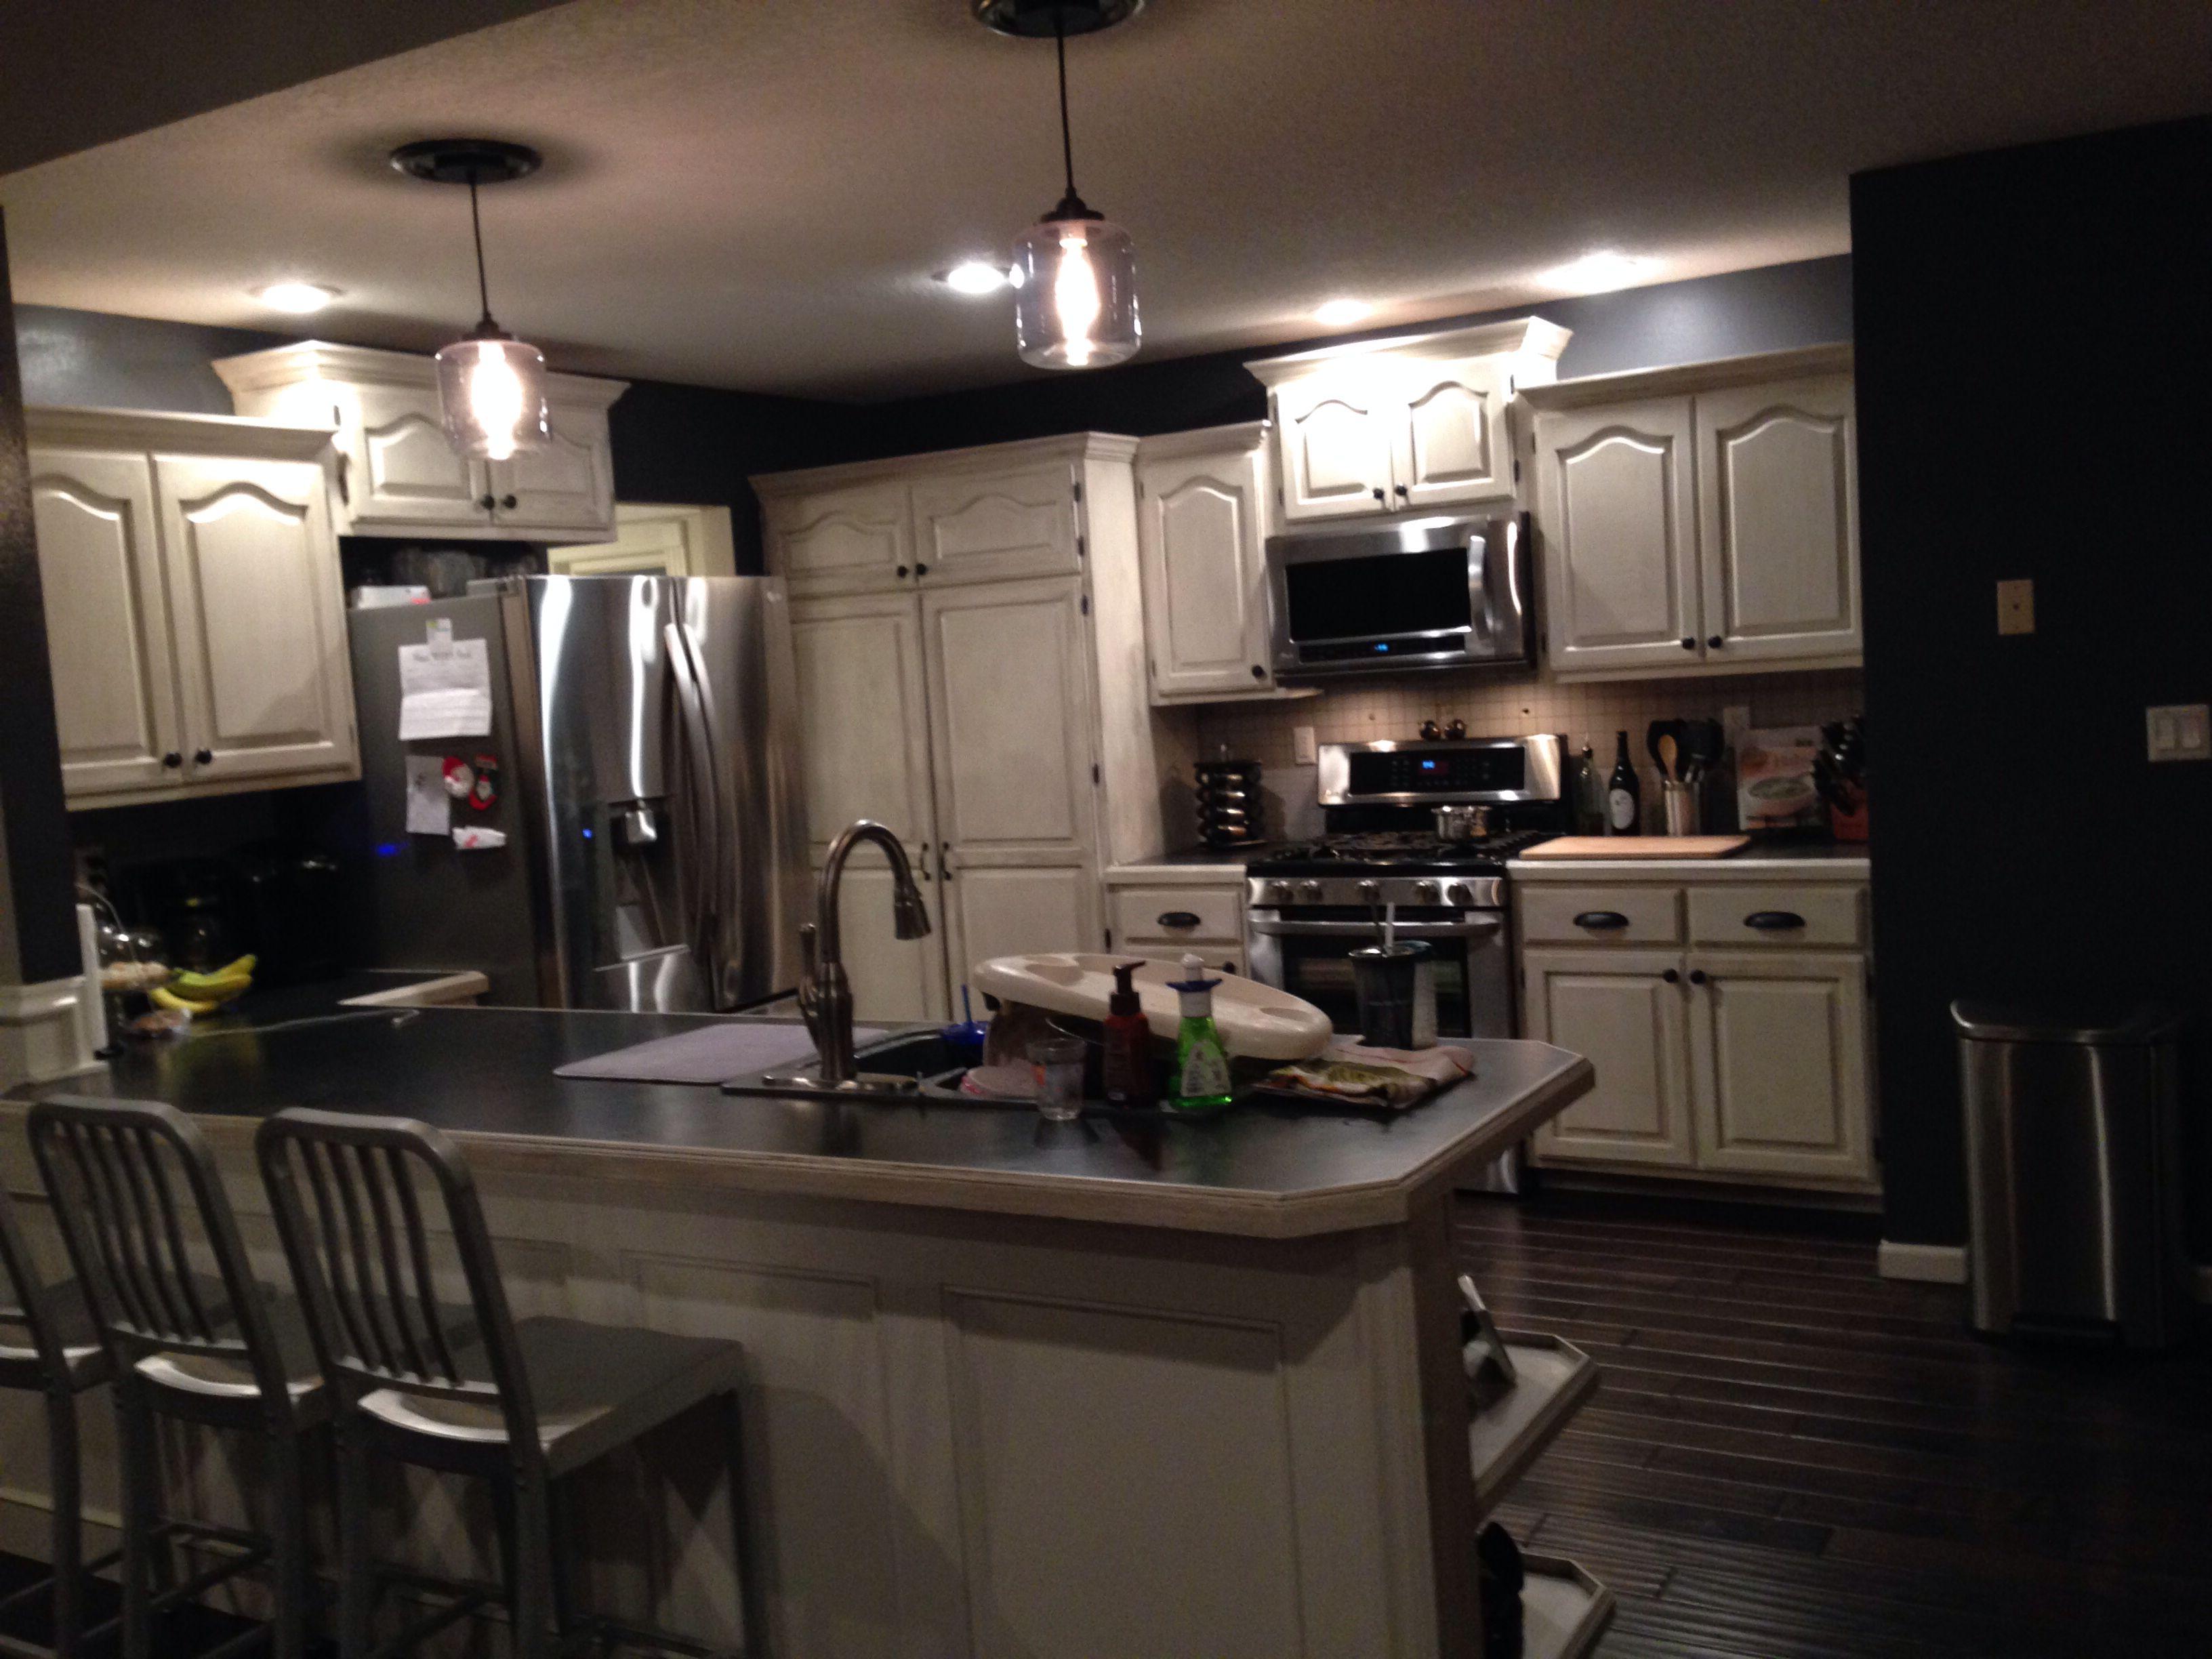 Sherwin Williams Peppercorn | Kitchen cabinets, Kitchen ...